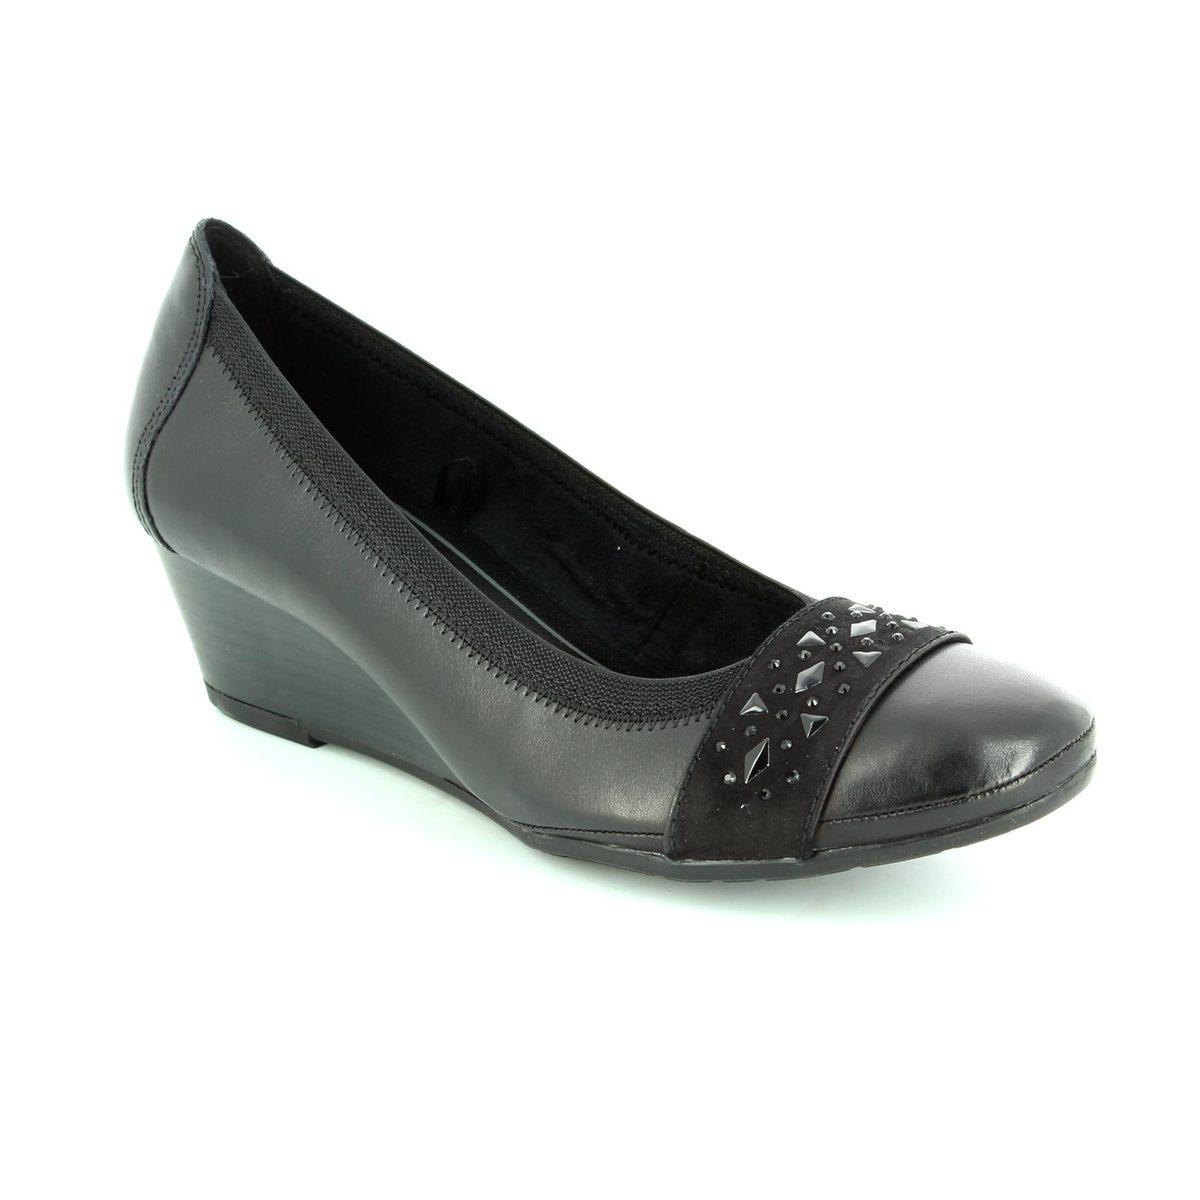 marco tozzi rancasta 22303 096 black wedge shoes. Black Bedroom Furniture Sets. Home Design Ideas